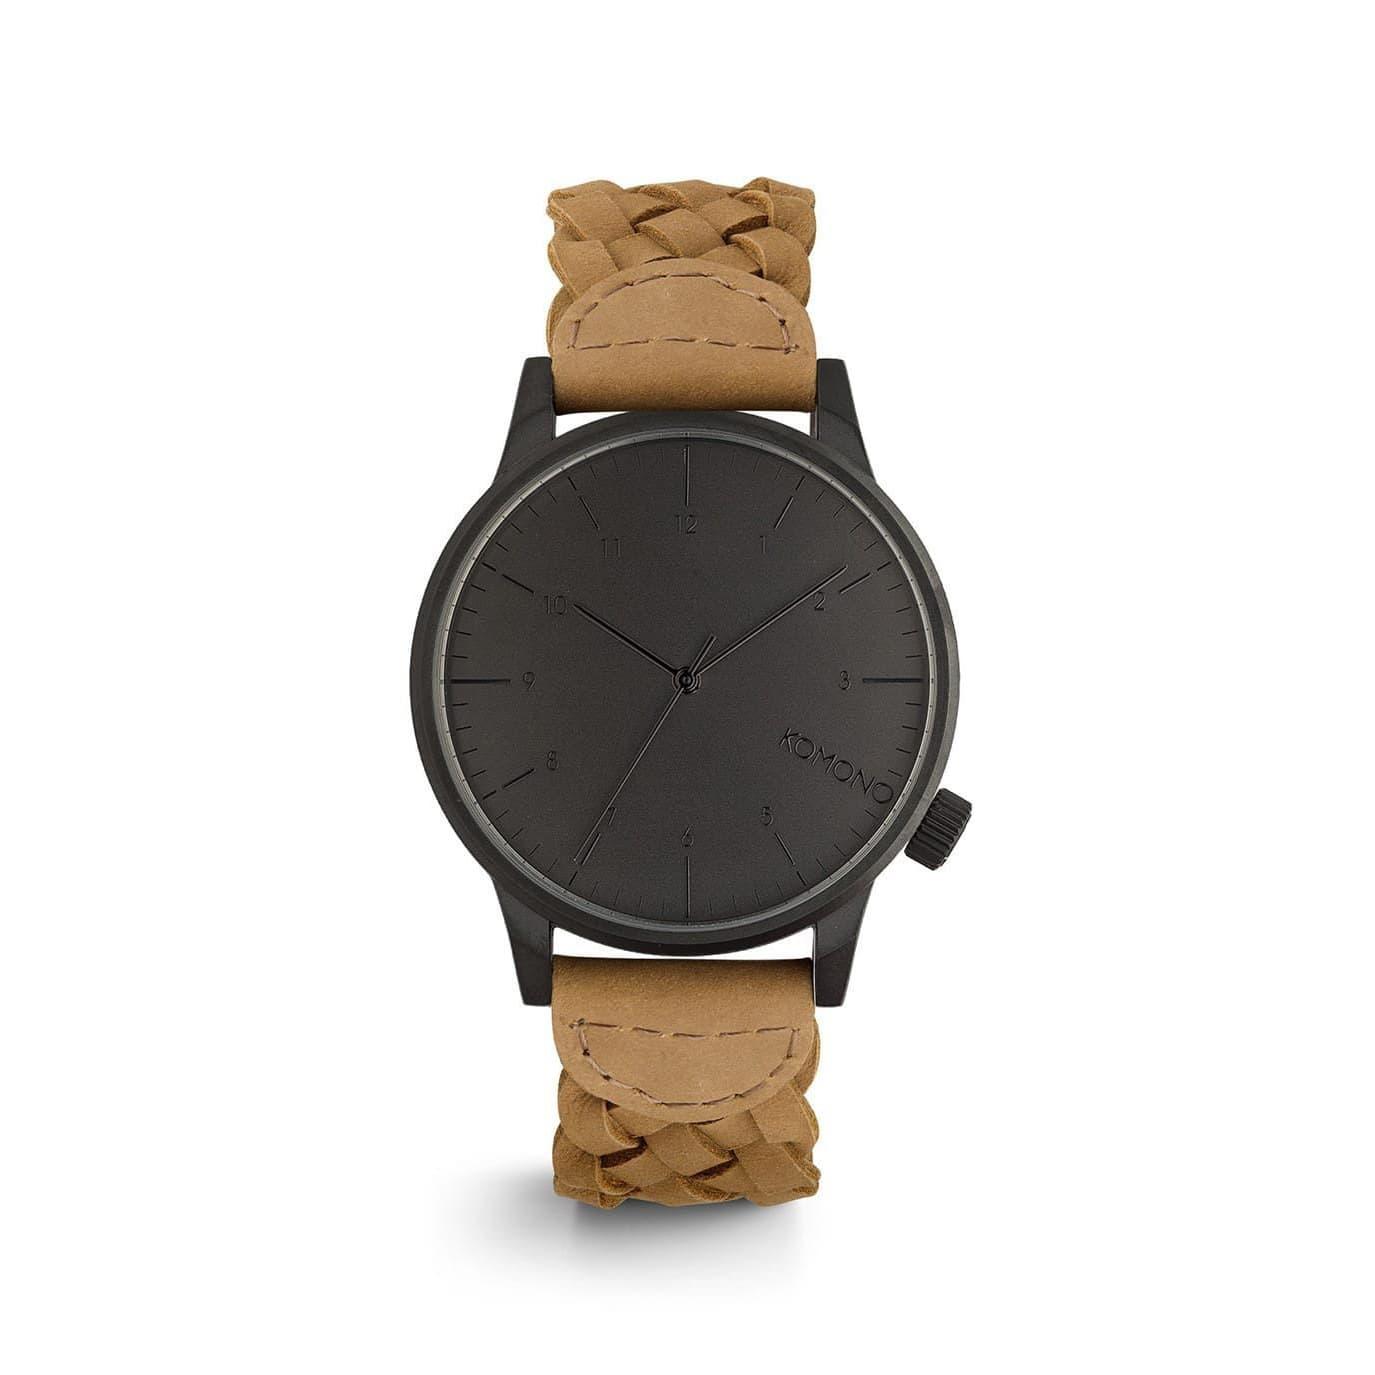 Komodo Men's Watch